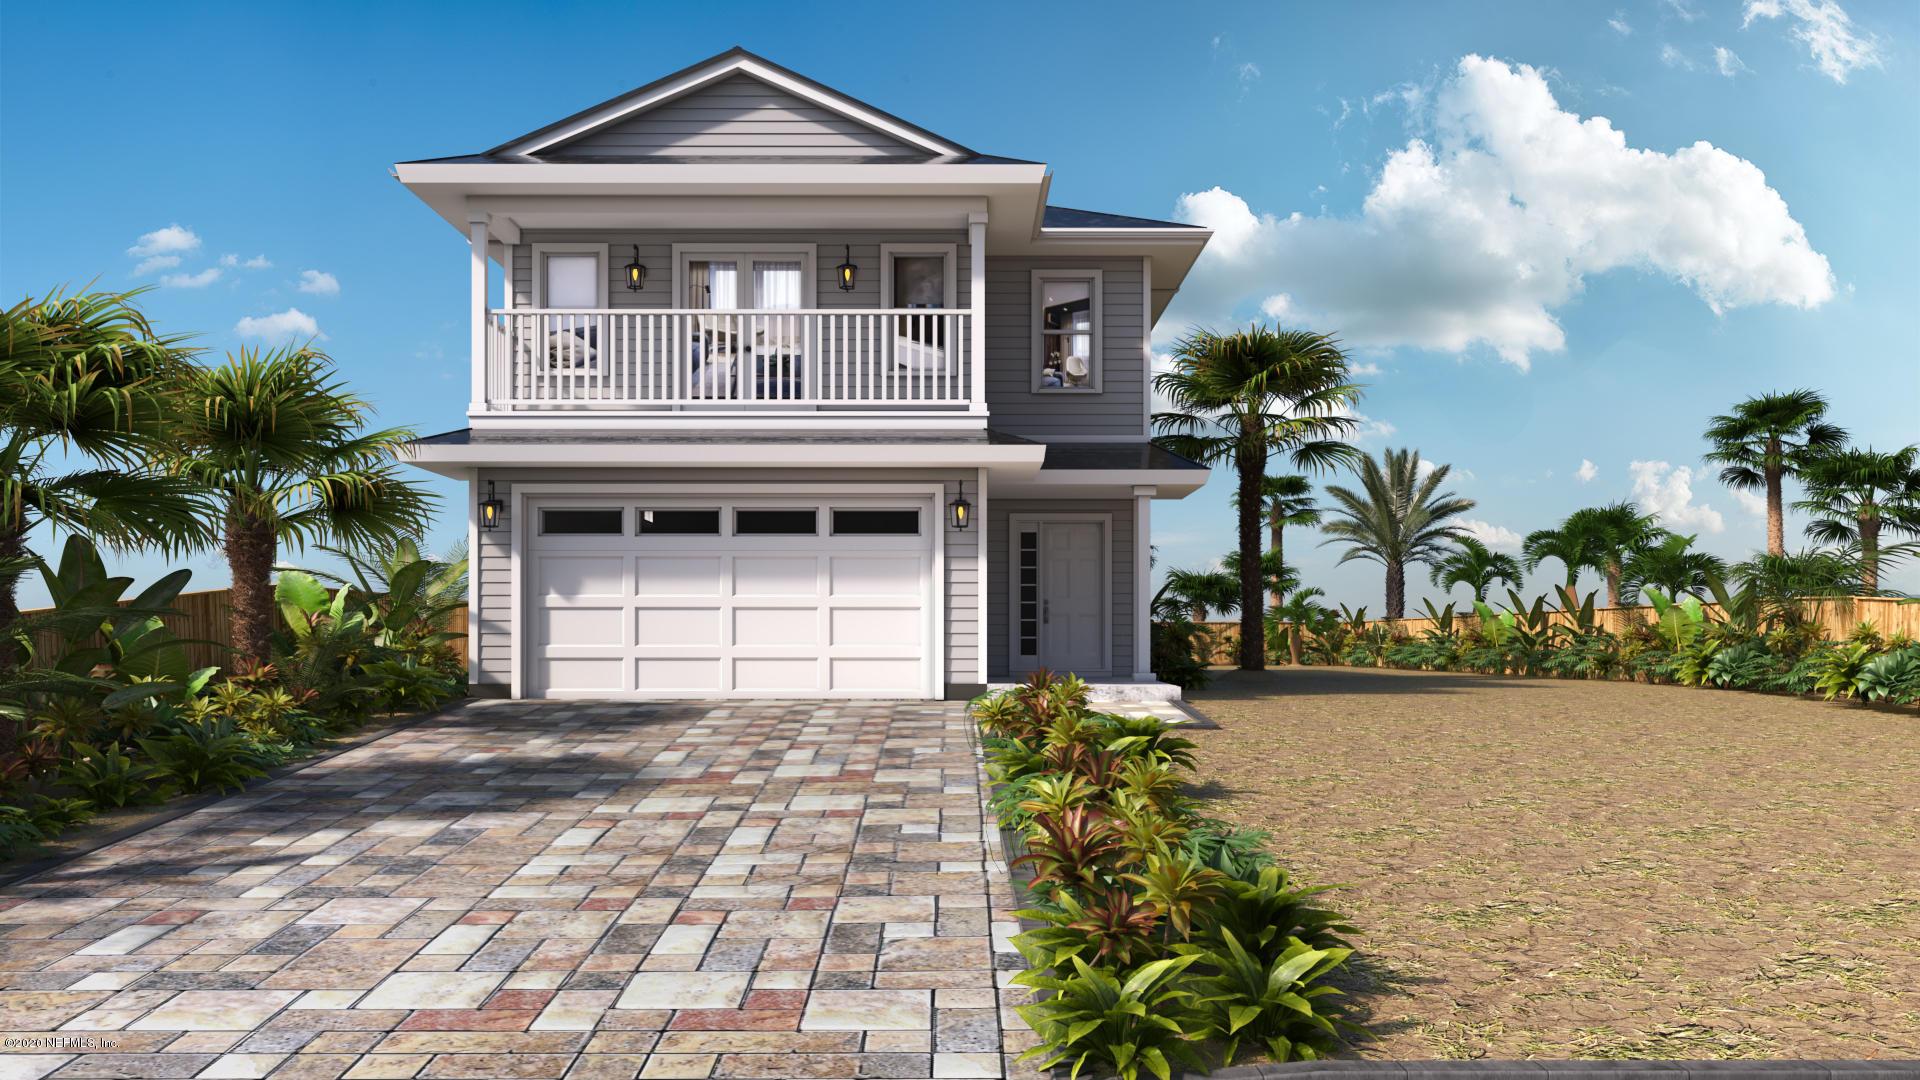 203 LORA, NEPTUNE BEACH, FLORIDA 32266, 4 Bedrooms Bedrooms, ,3 BathroomsBathrooms,Residential,For sale,LORA,1036873